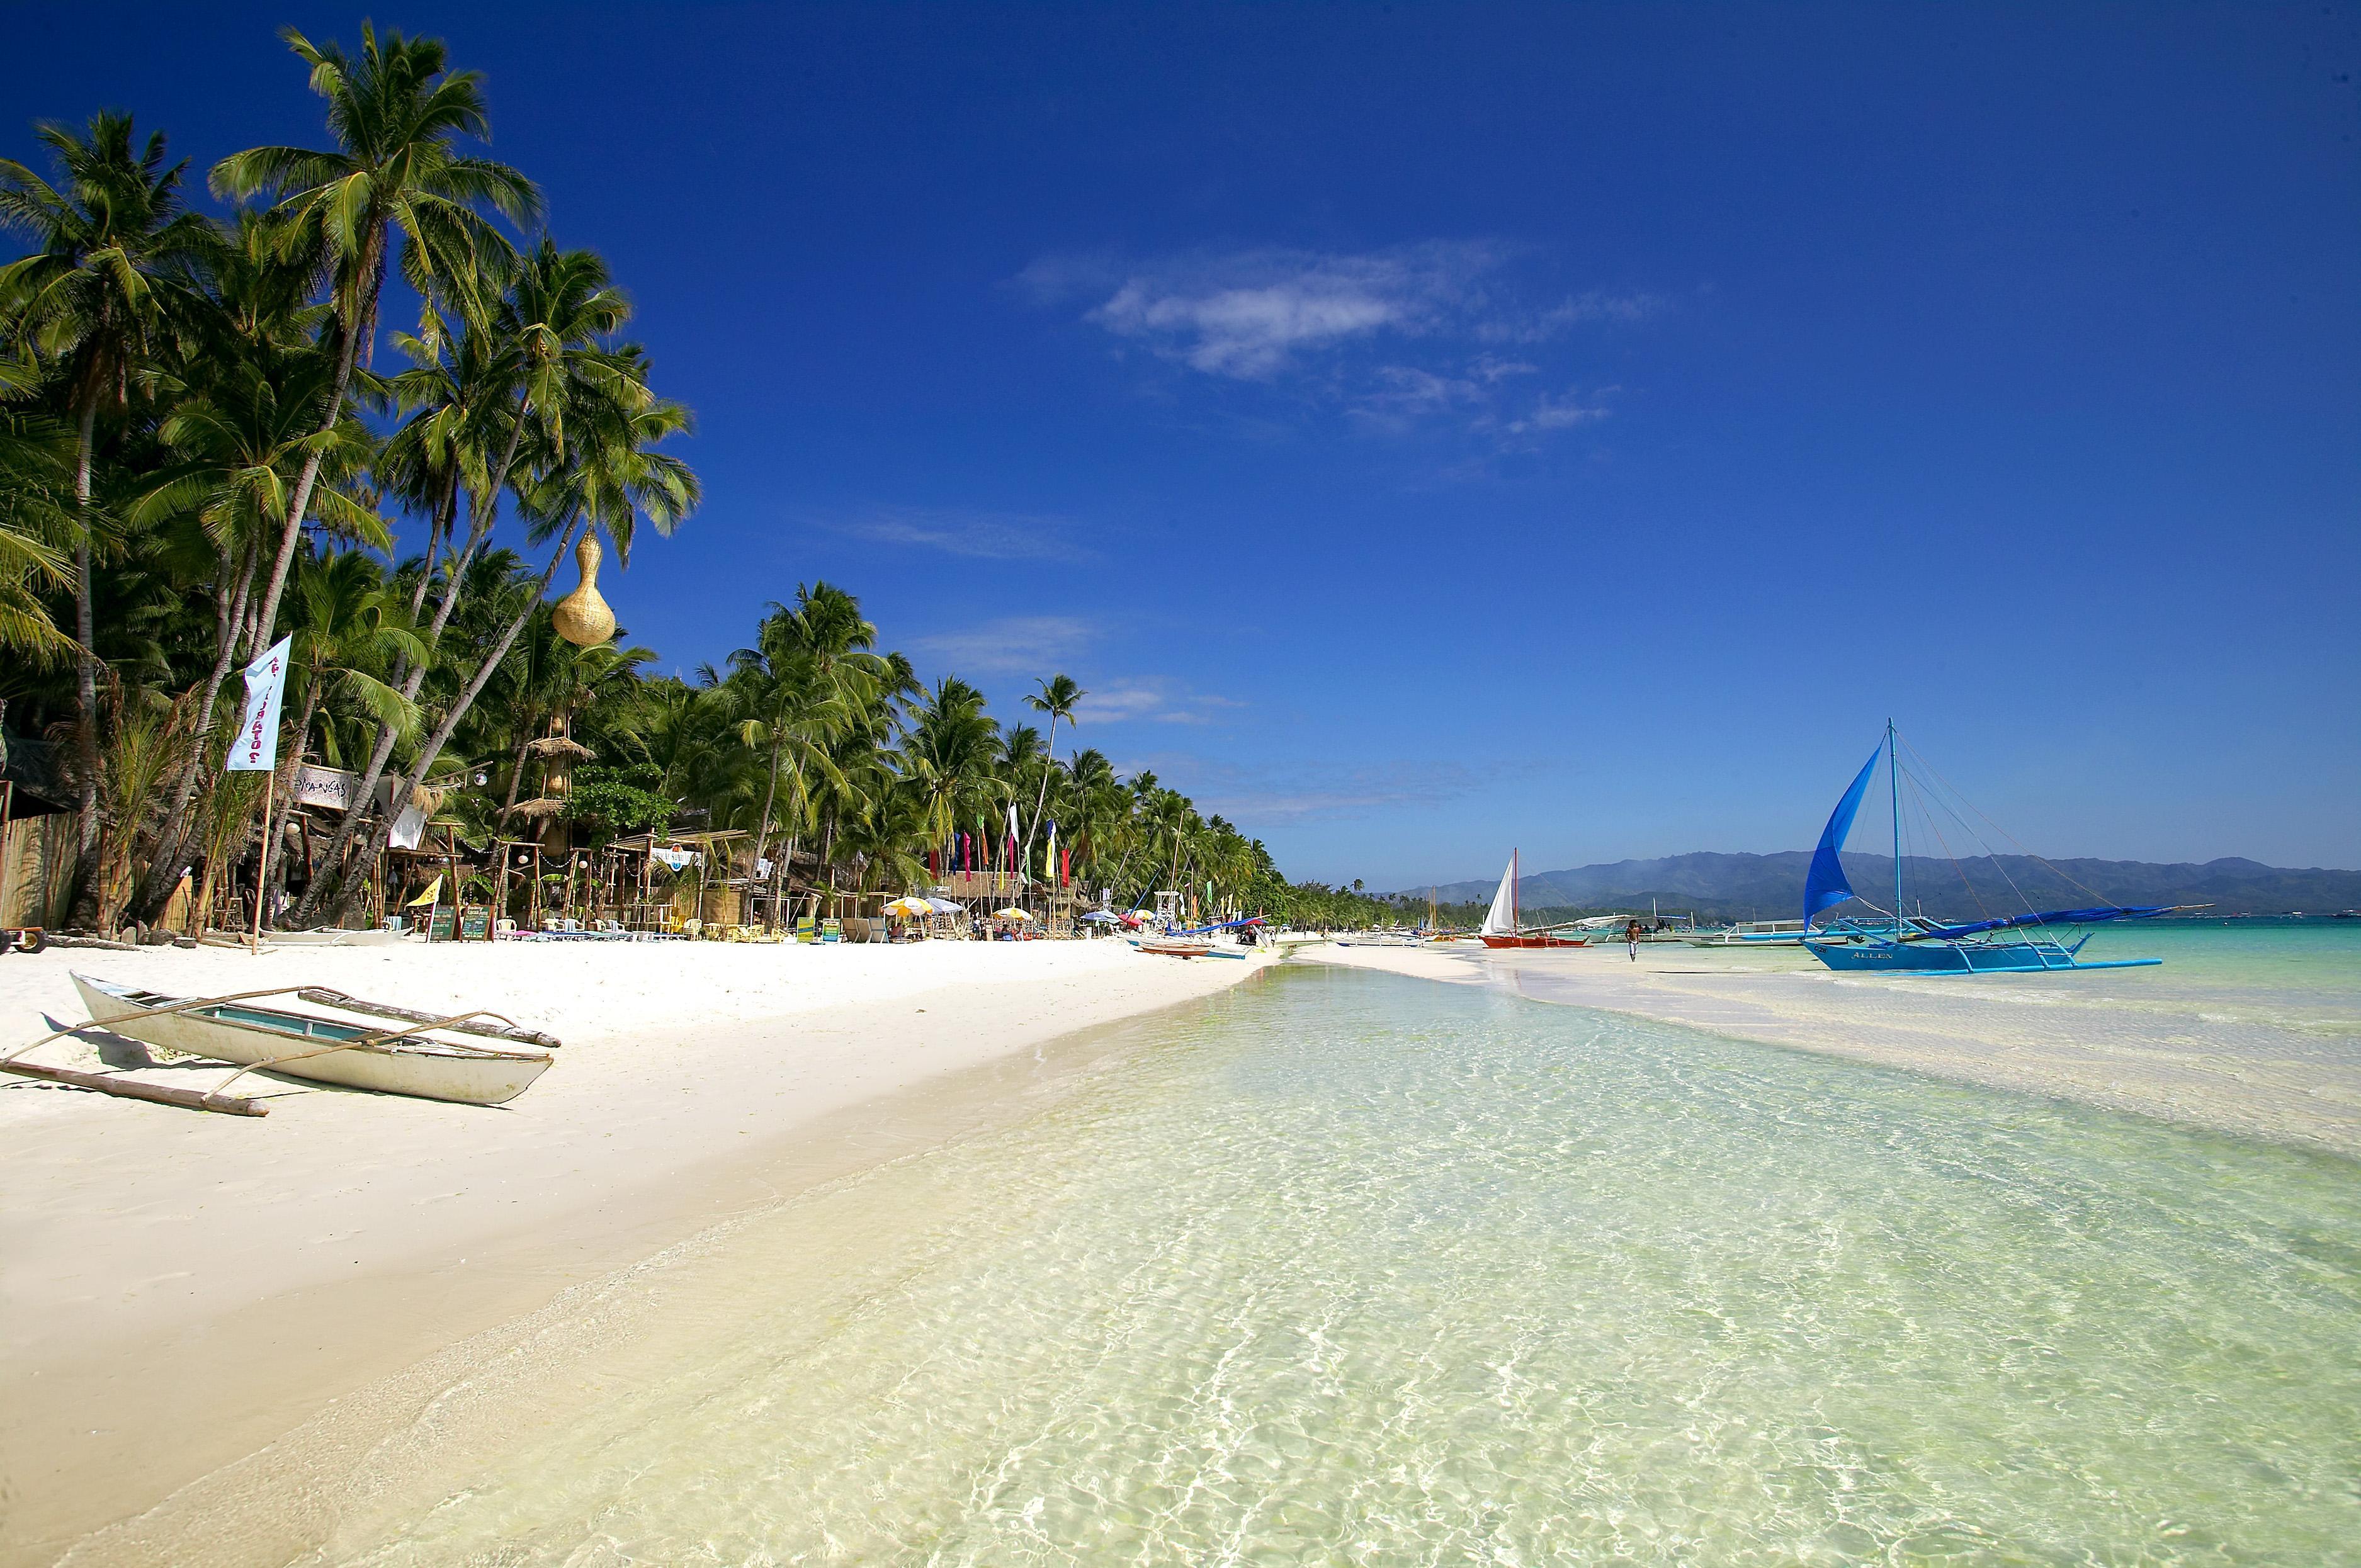 The Beauty of Boracay Island